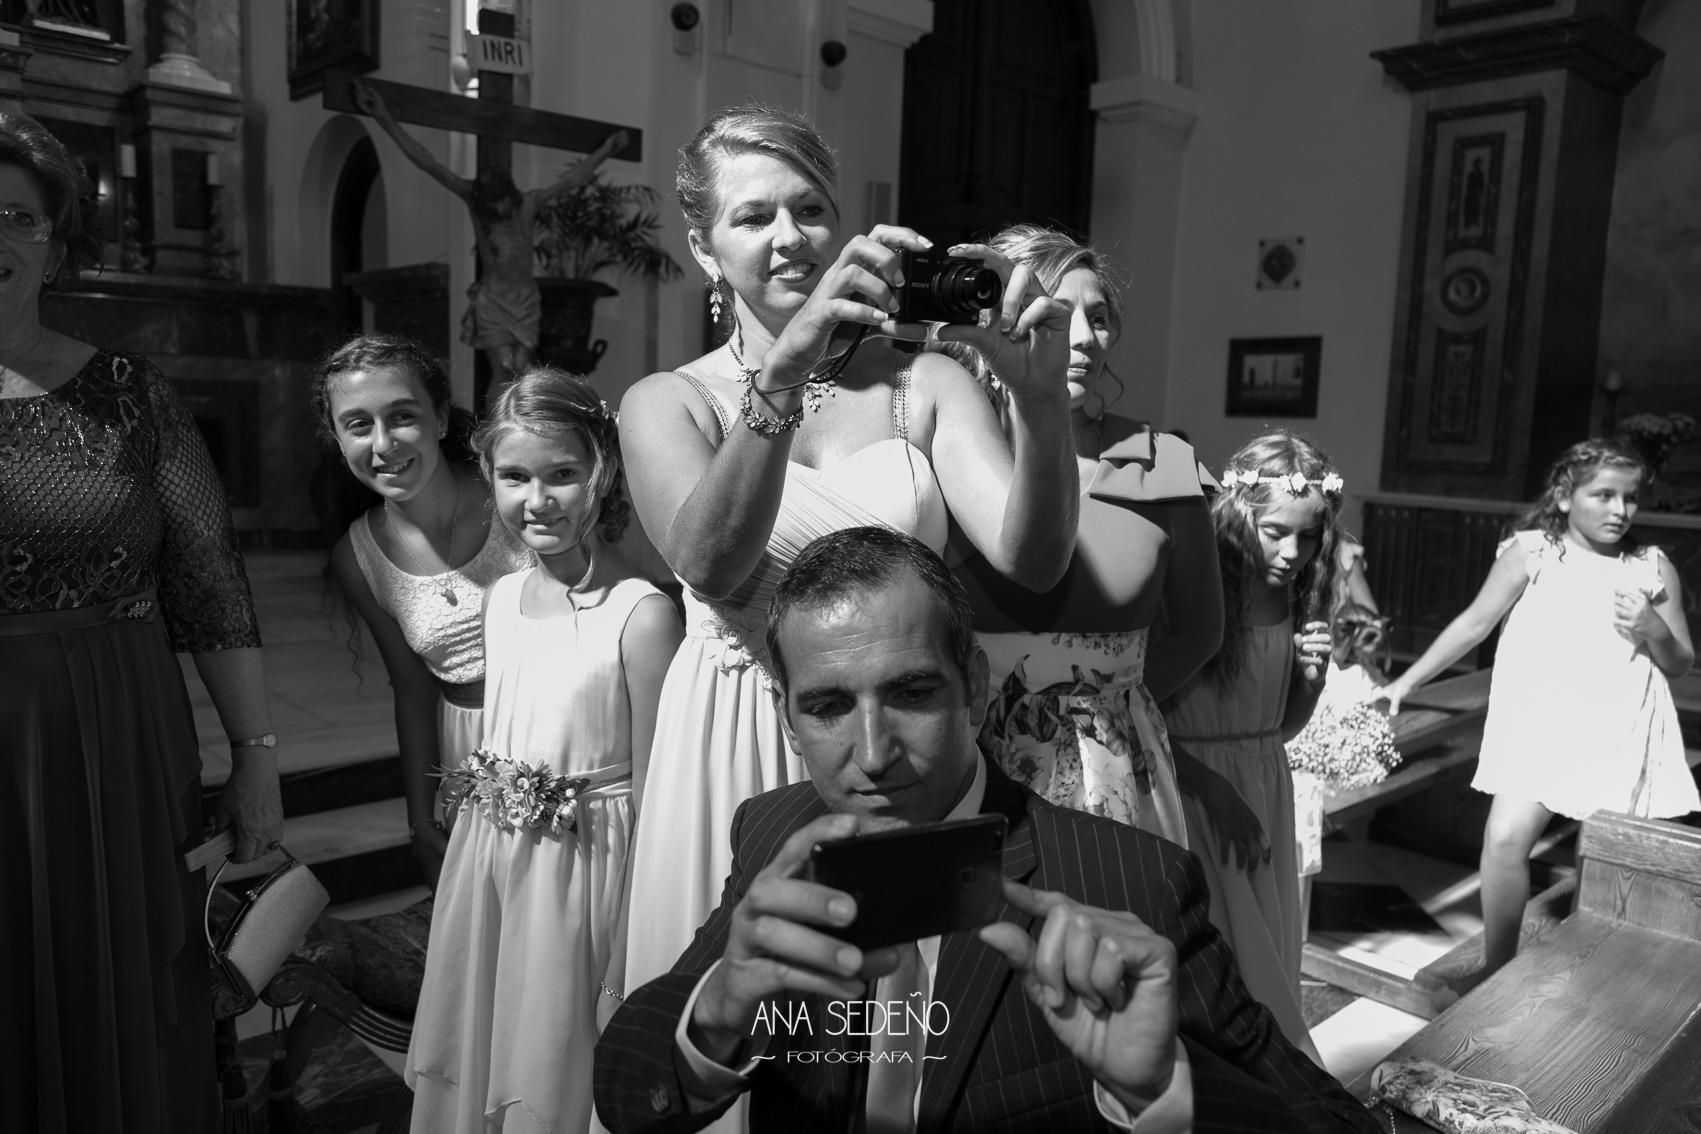 Ana Sedeño Fotografa.-Boda A&V0569